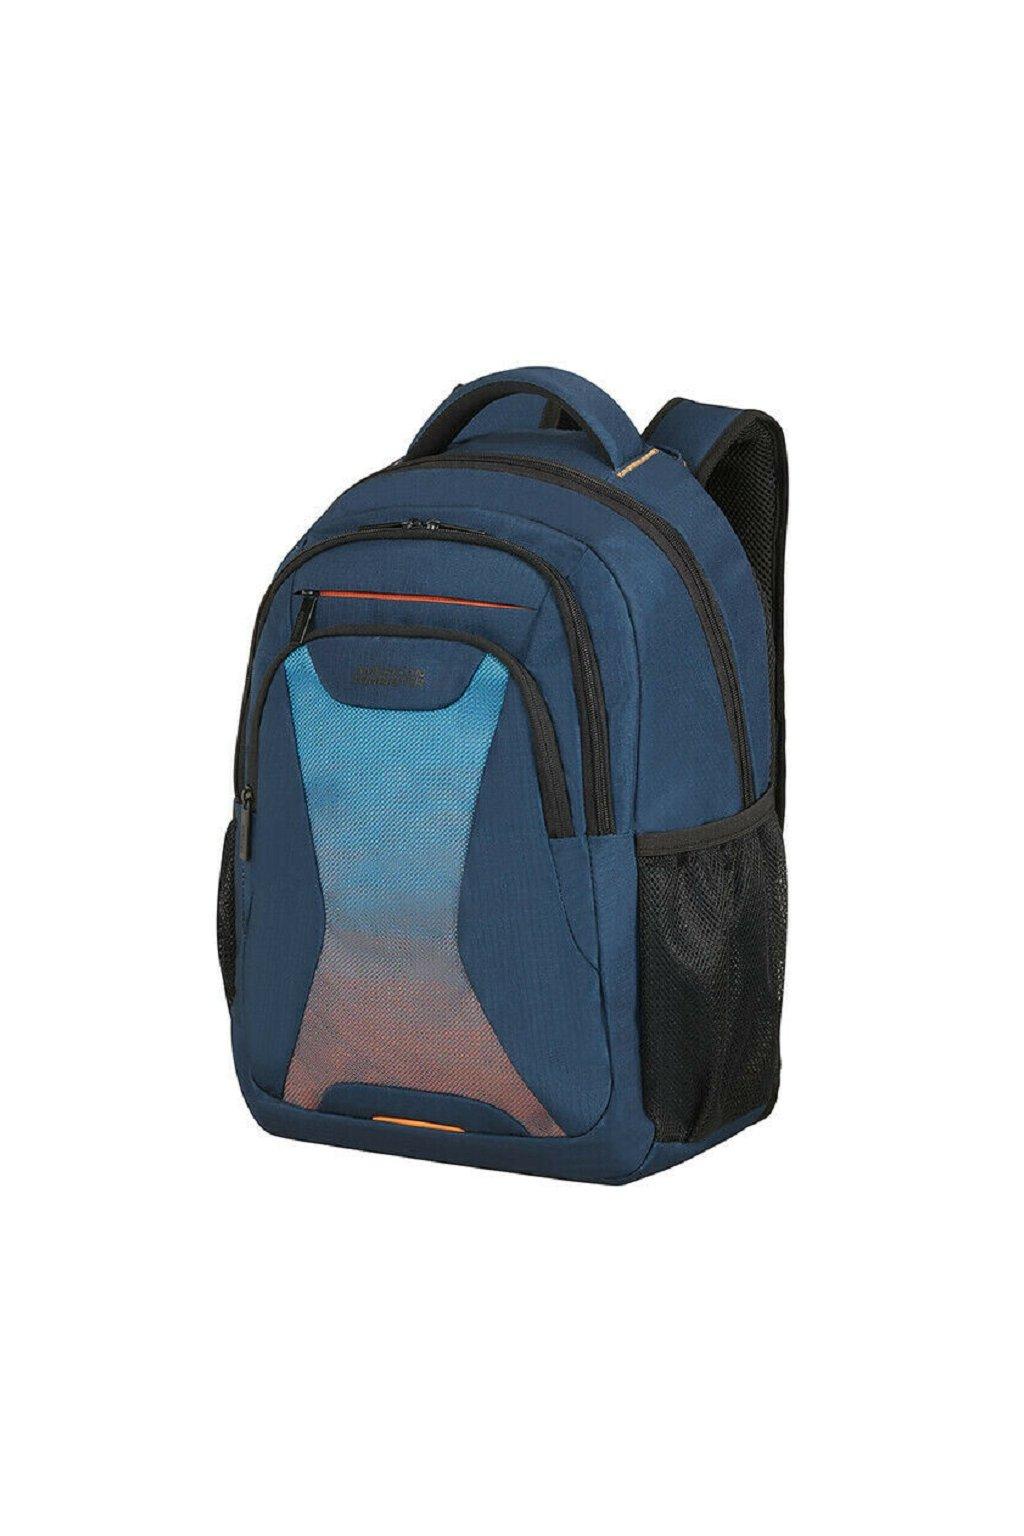 kufrland americantourister atwork laptopbackpack gradient bluegradation (4)